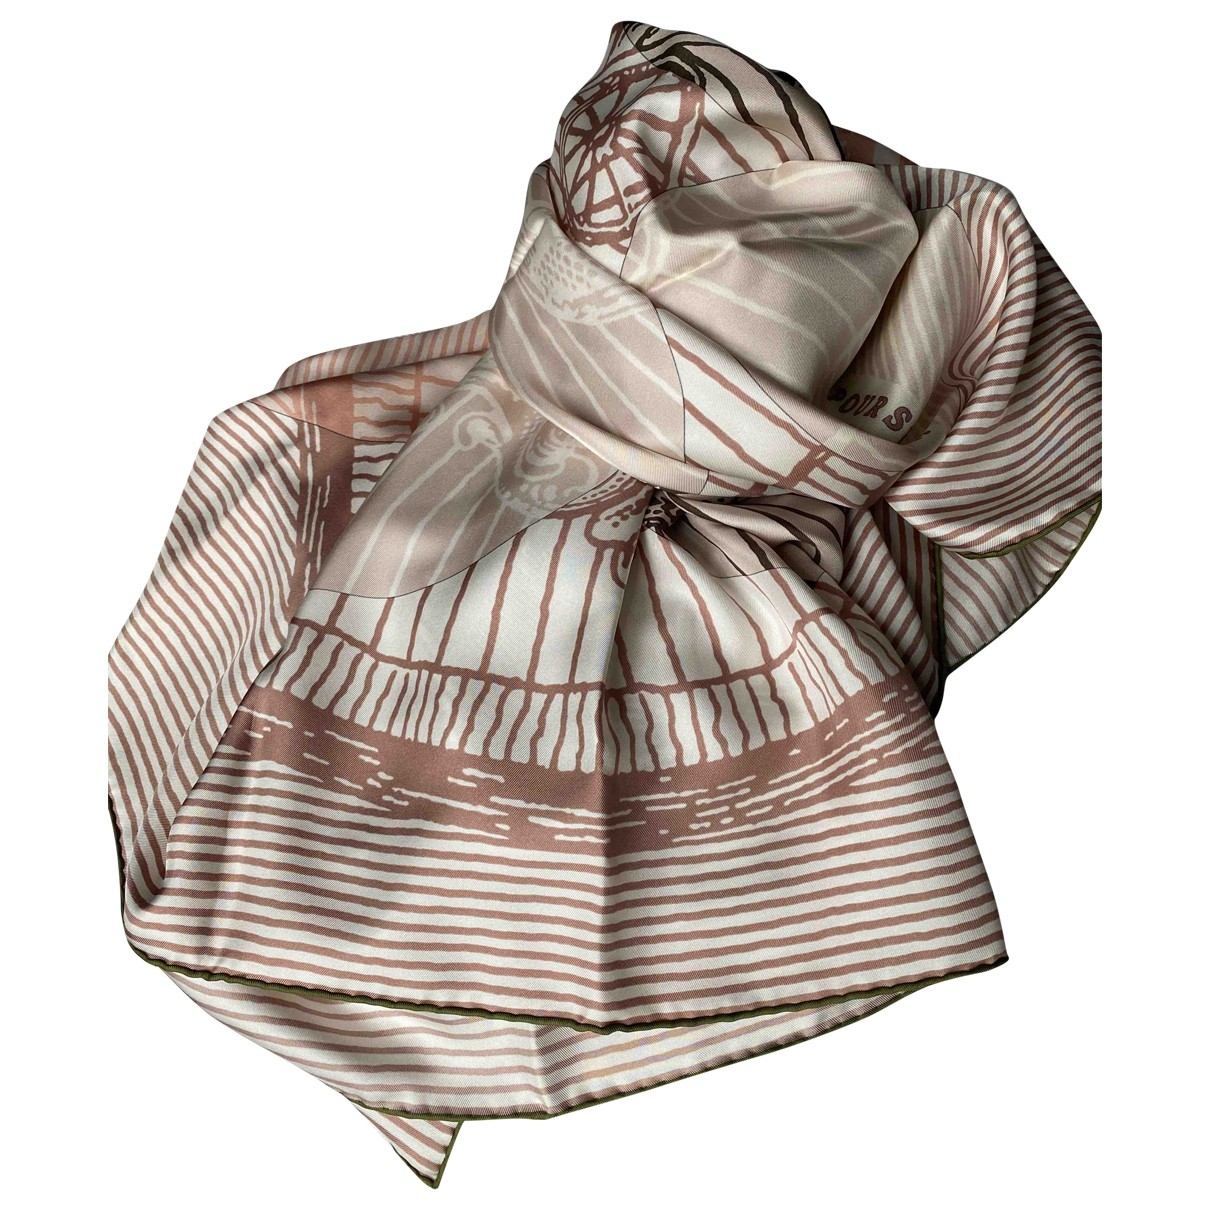 Estola Carre Geant silk de Seda Hermes